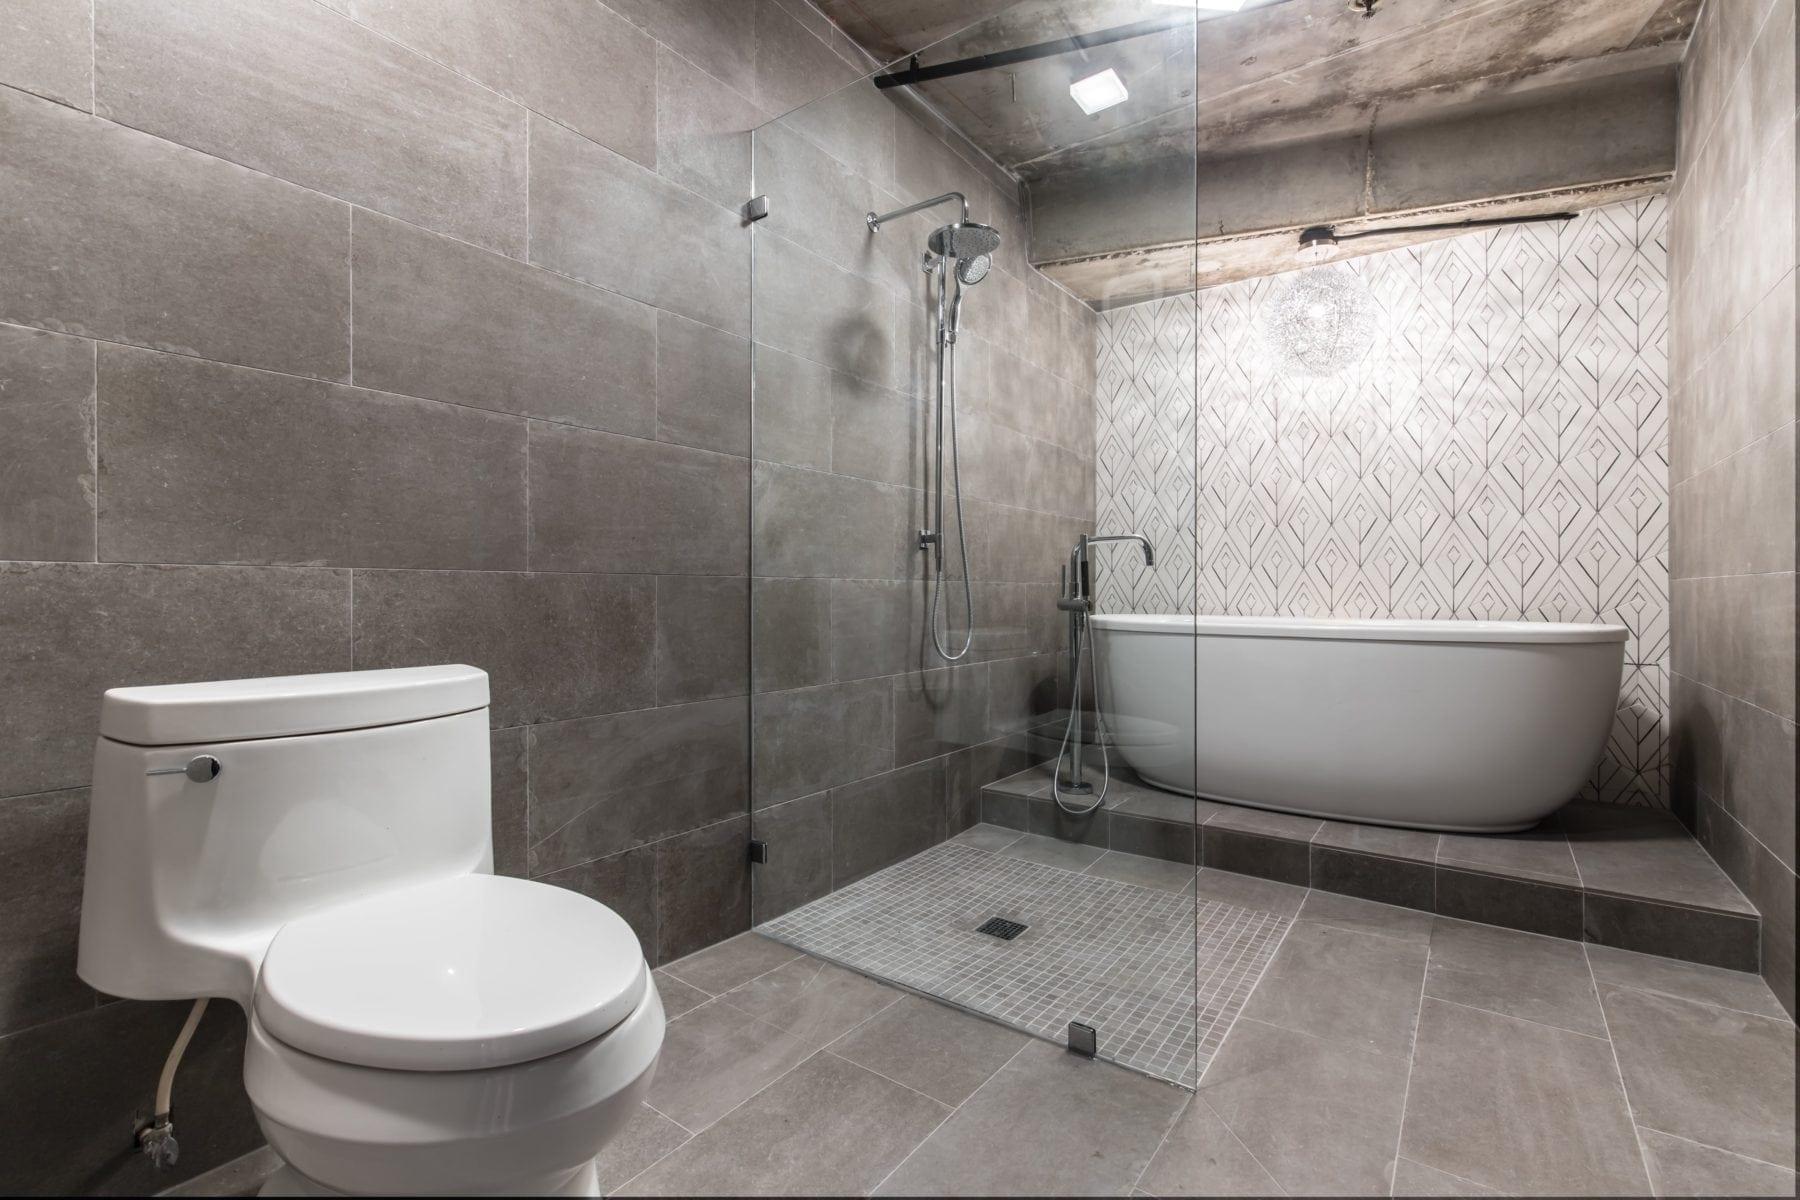 New Wet room master bathroom after Renowned Renovation Uptown Condo Bathroom Remodel